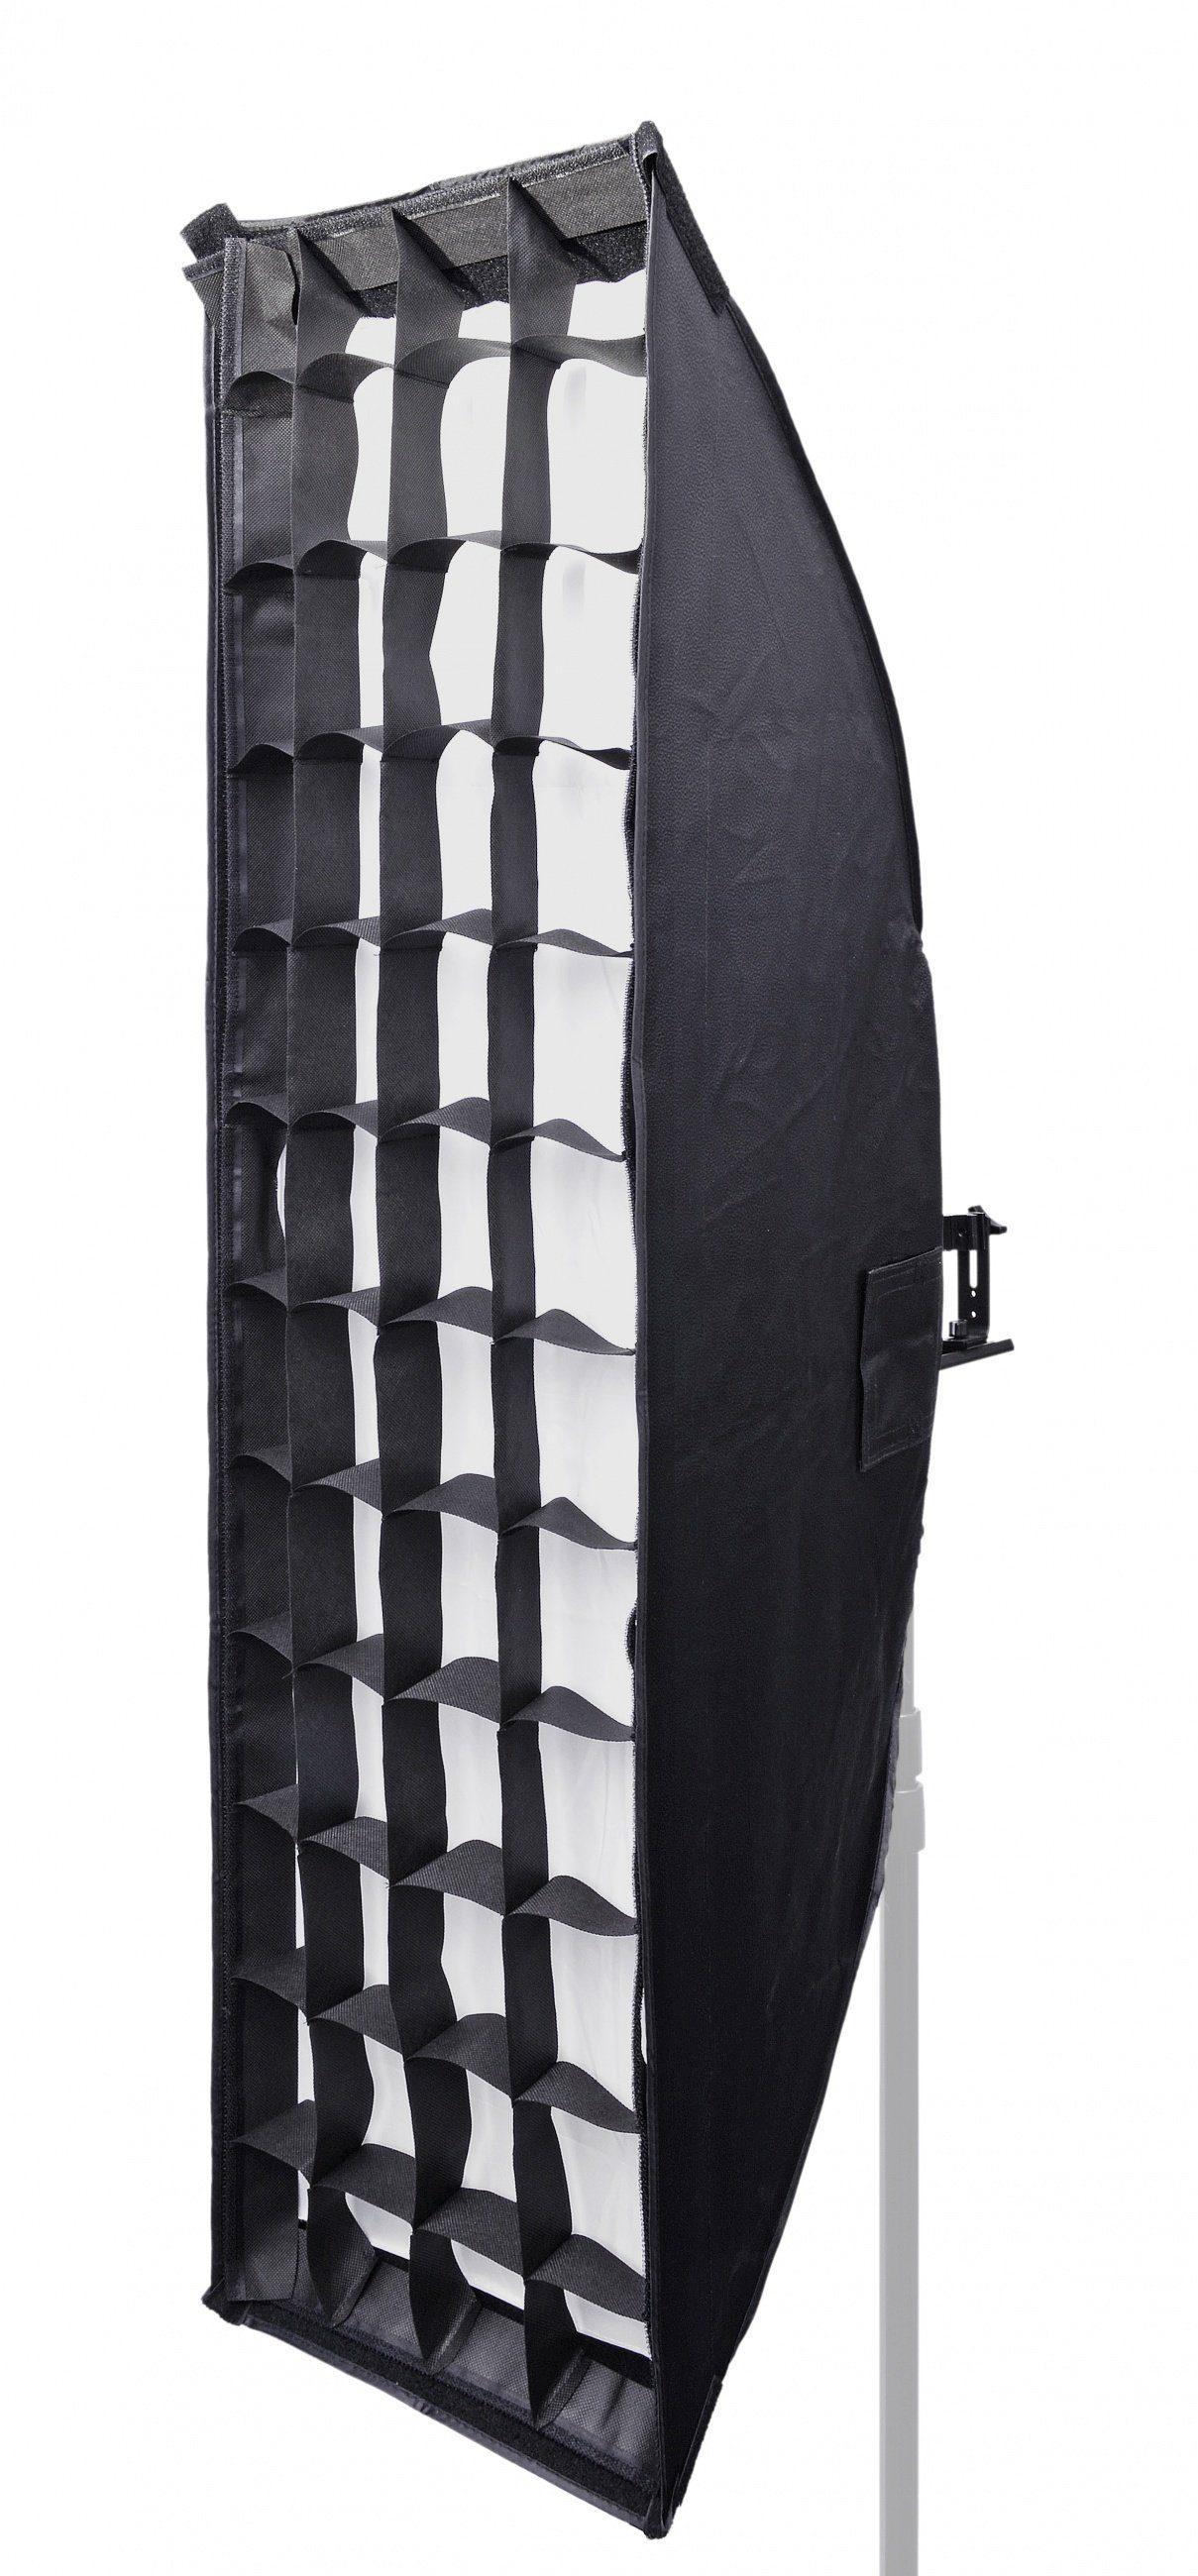 BRESSER Fotostudio »BRESSER SS-9 Softbox High Grade 30x120cm mit Wabe«